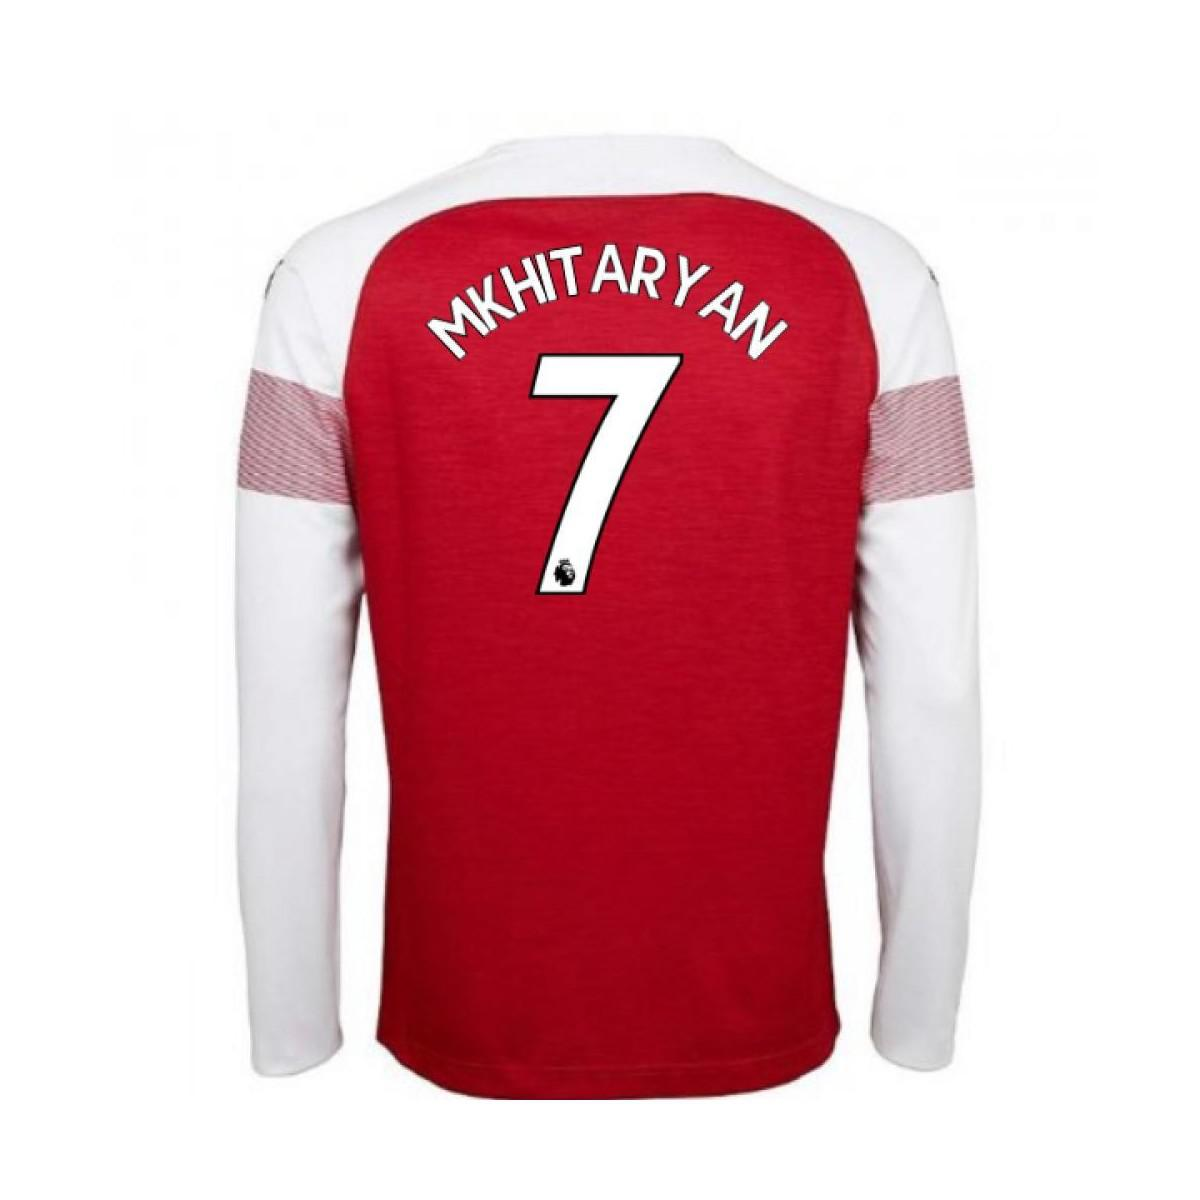 381e105608f PUMA 2018-2019 Arsenal Home Long Sleeve Shirt (mkhitaryan 7) Women s ...